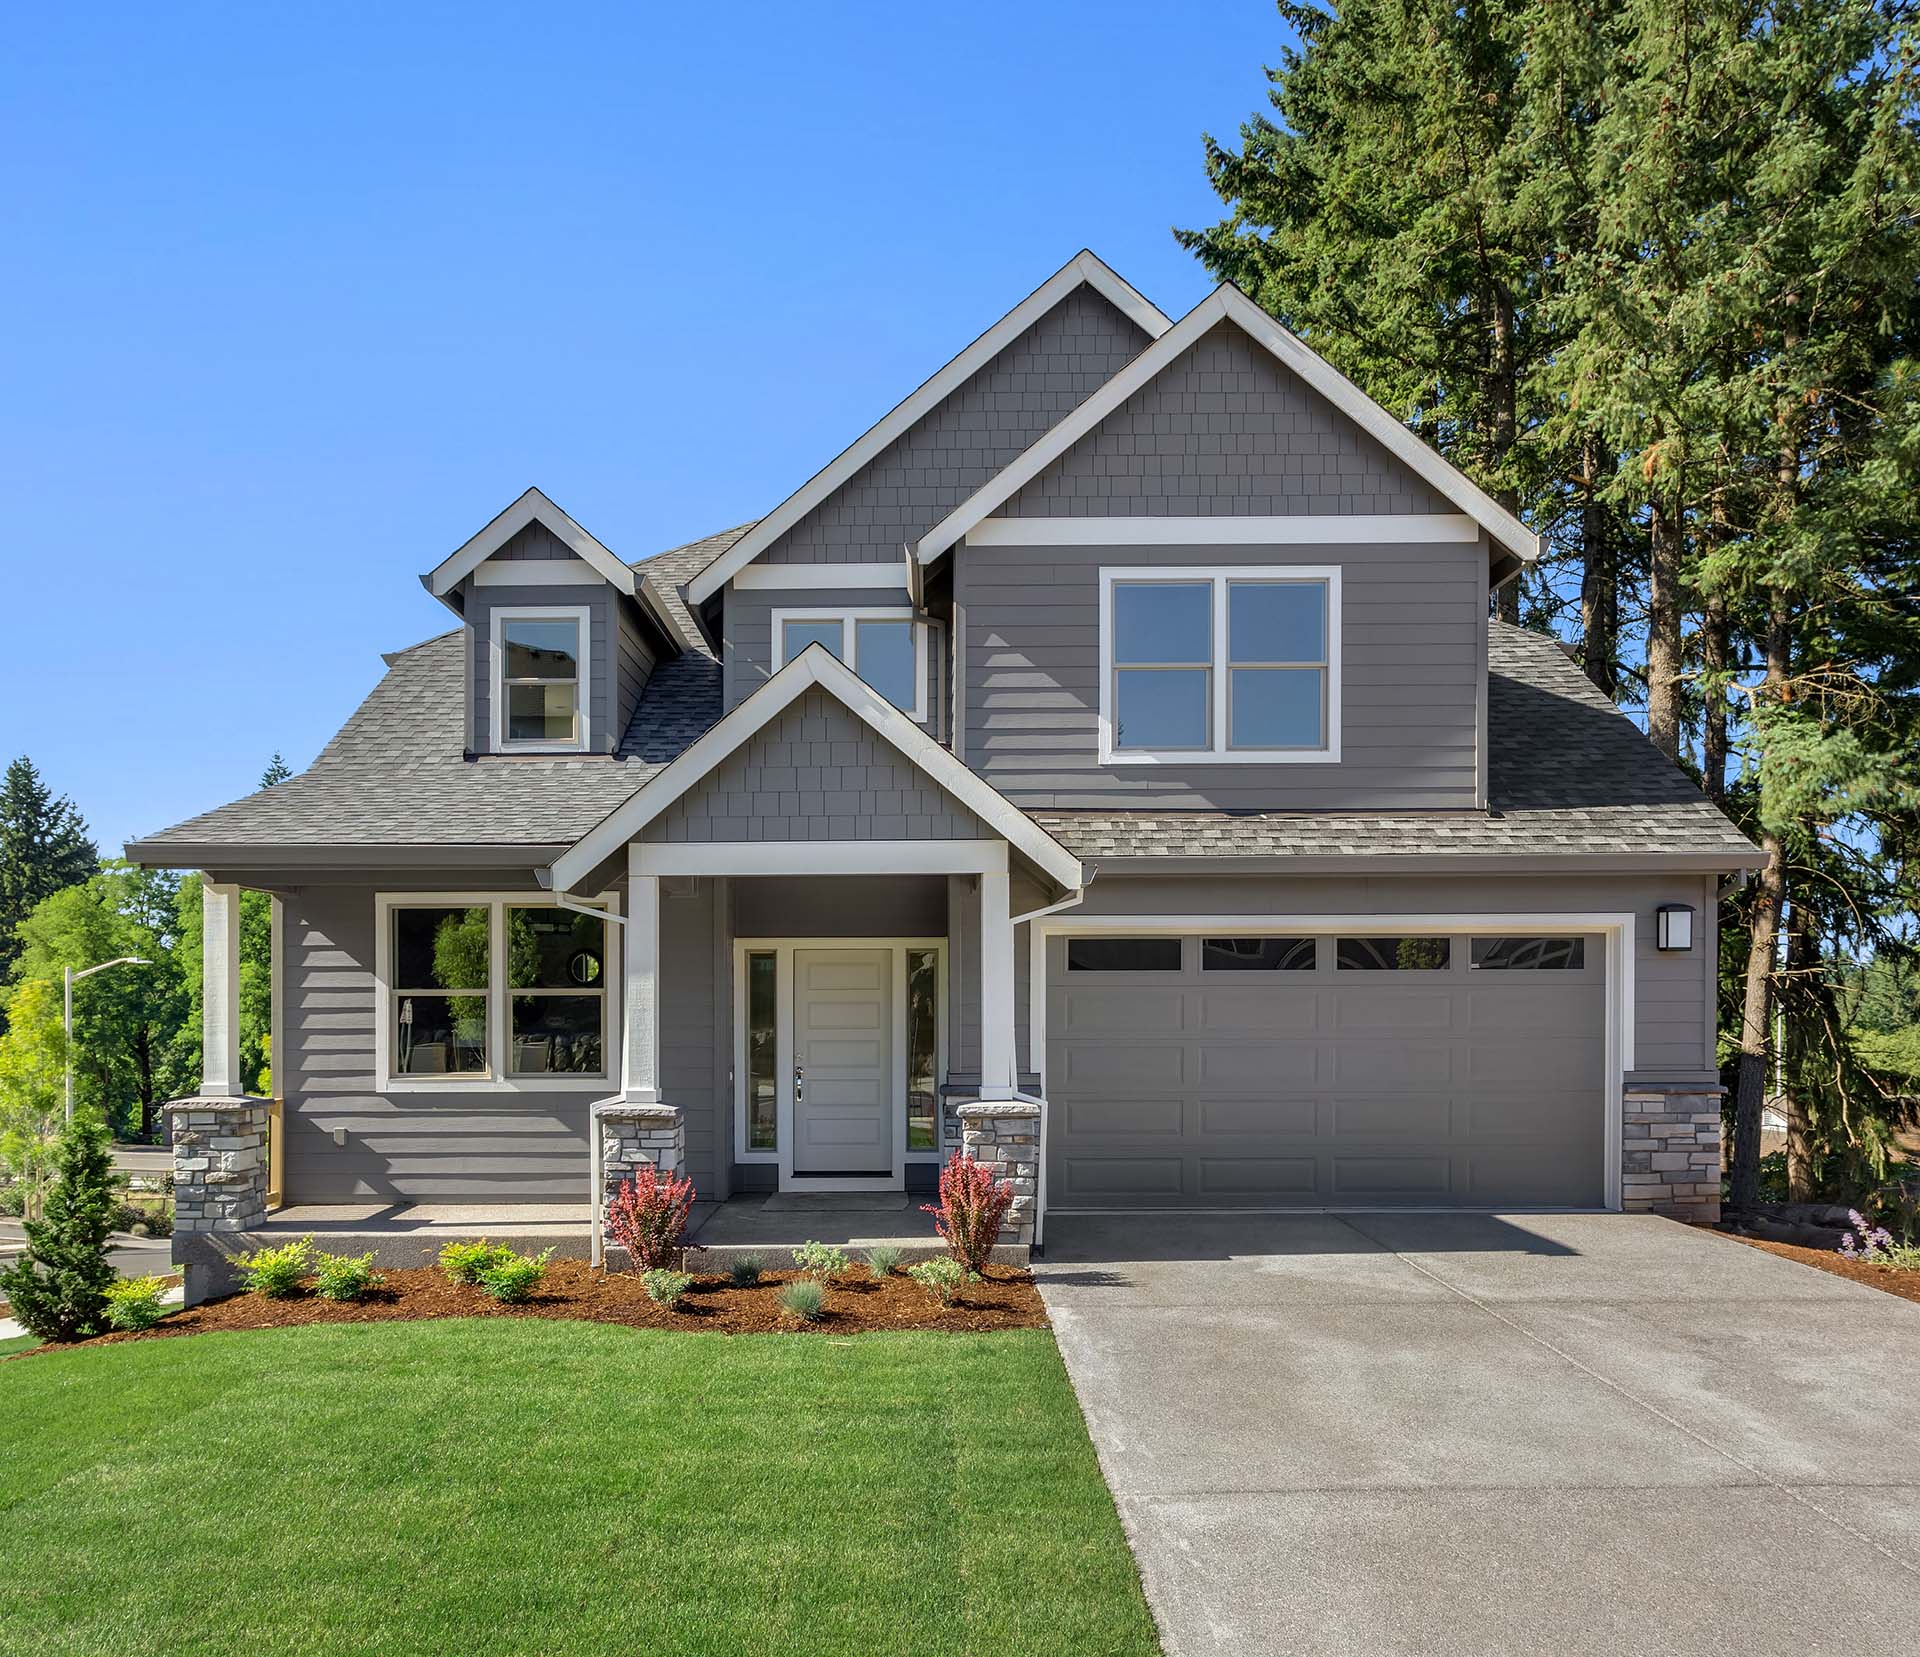 Suburban home with propane heat